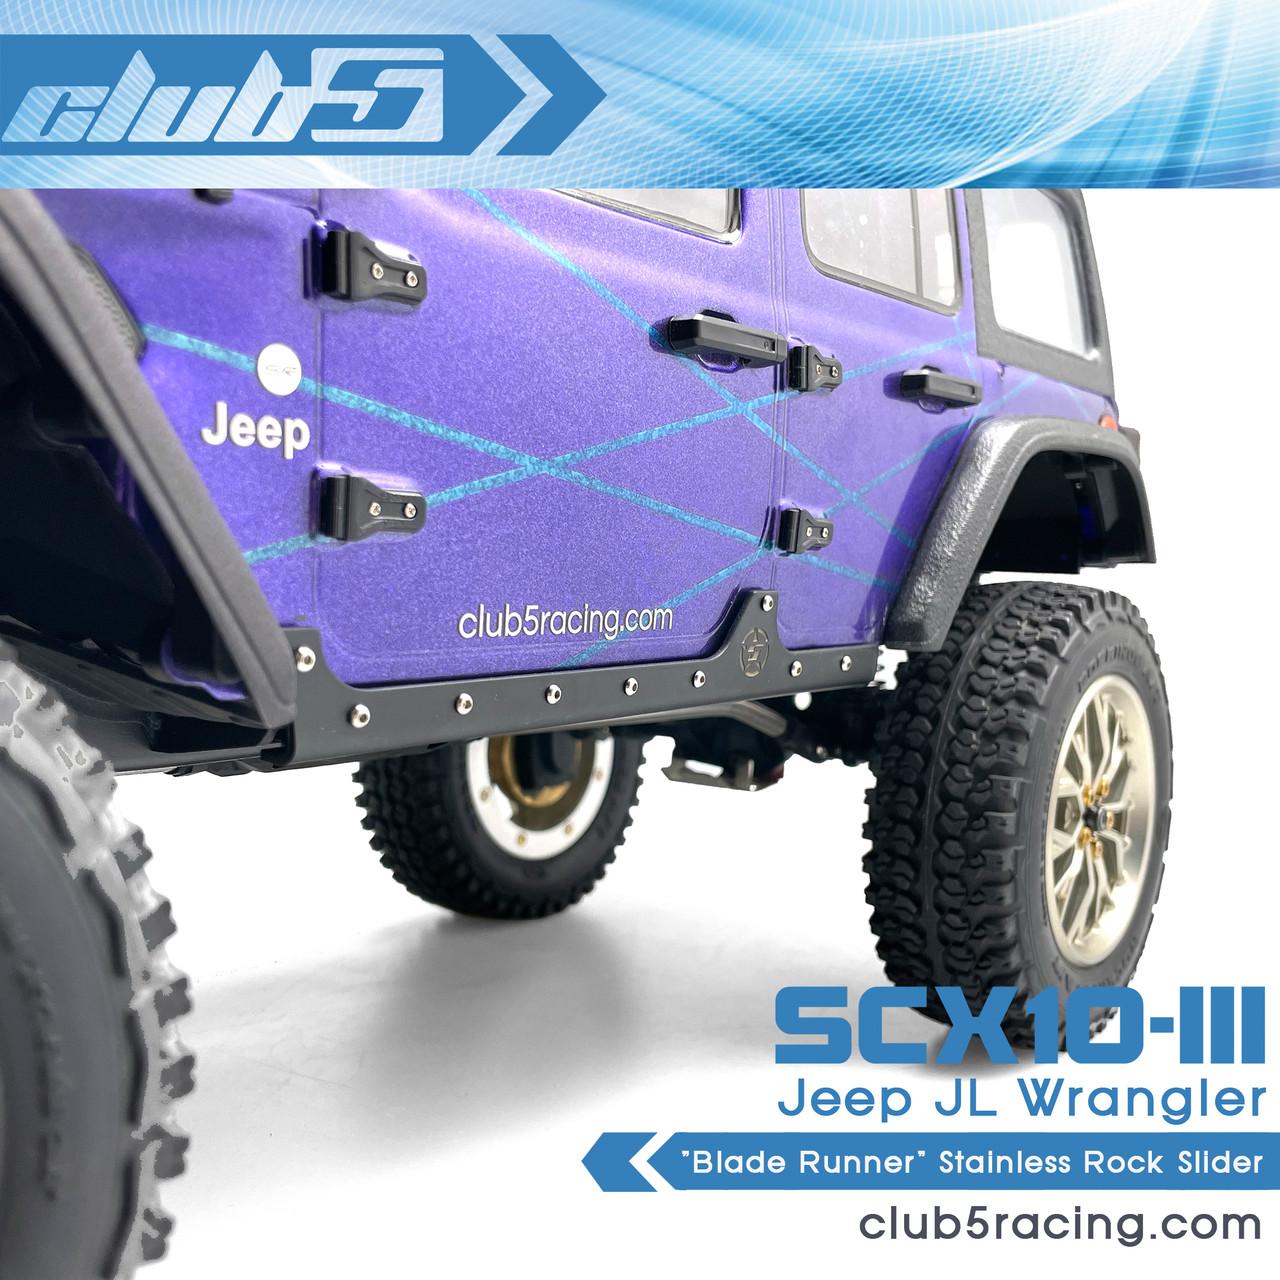 """Blade Runner"" Stainless Rock Slider for Axial SCX10 III Jeep JLU Wrangler"